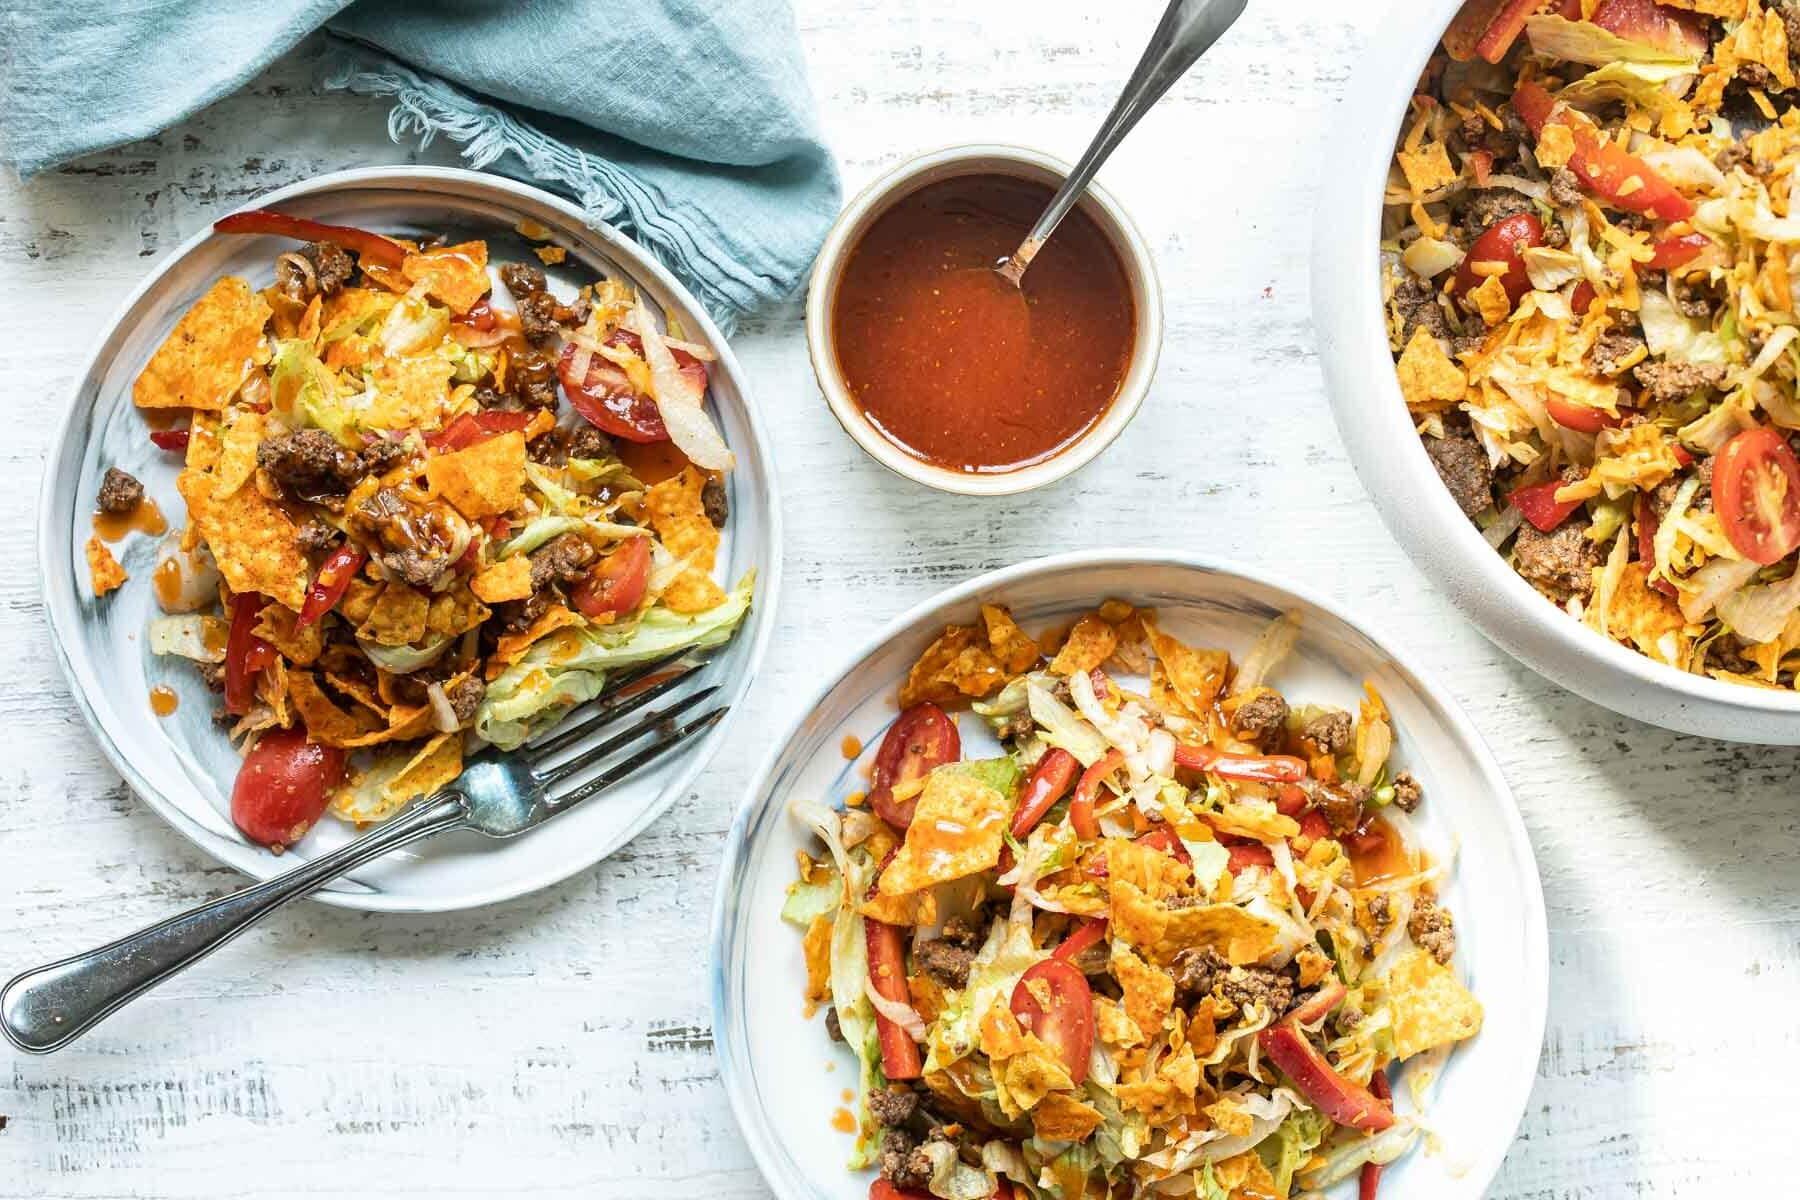 Two bowls filled with Dorito Taco Salad.